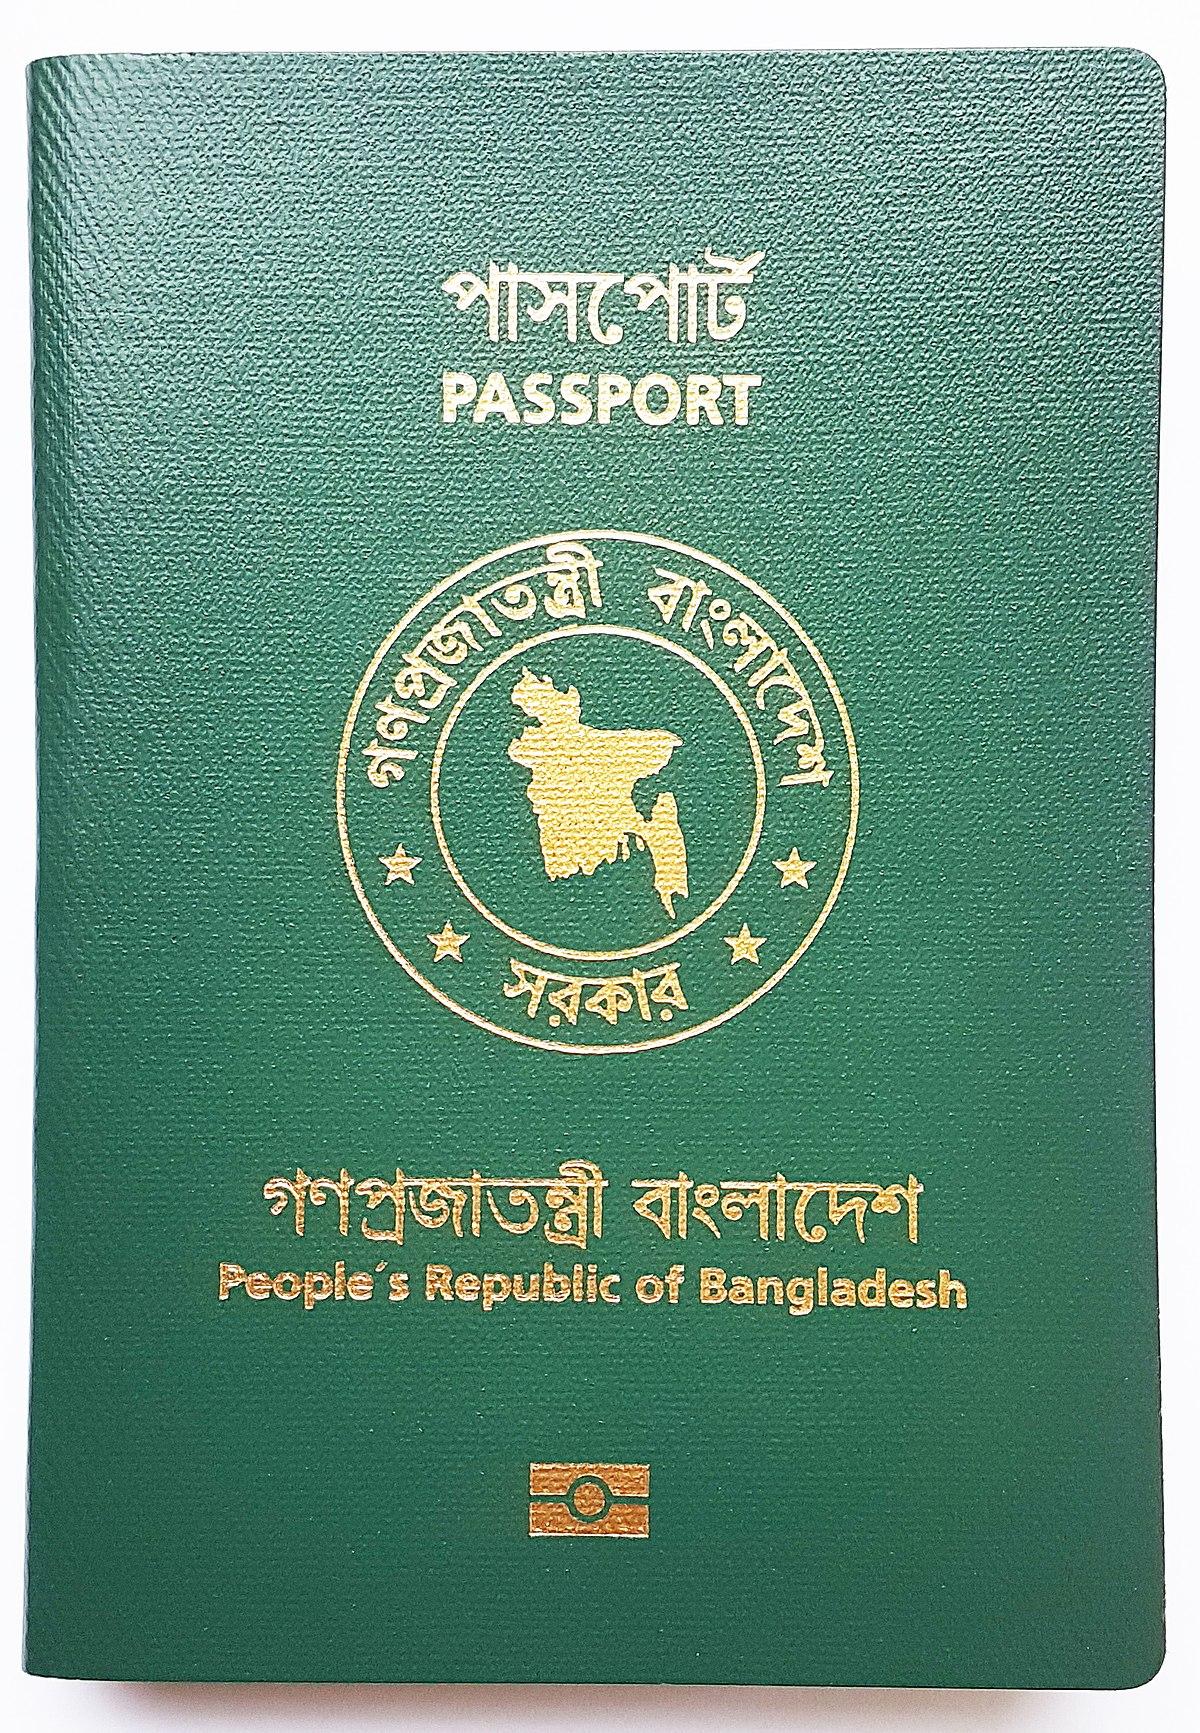 Visa Requirements For Bangladeshi Citizens Wikipedia